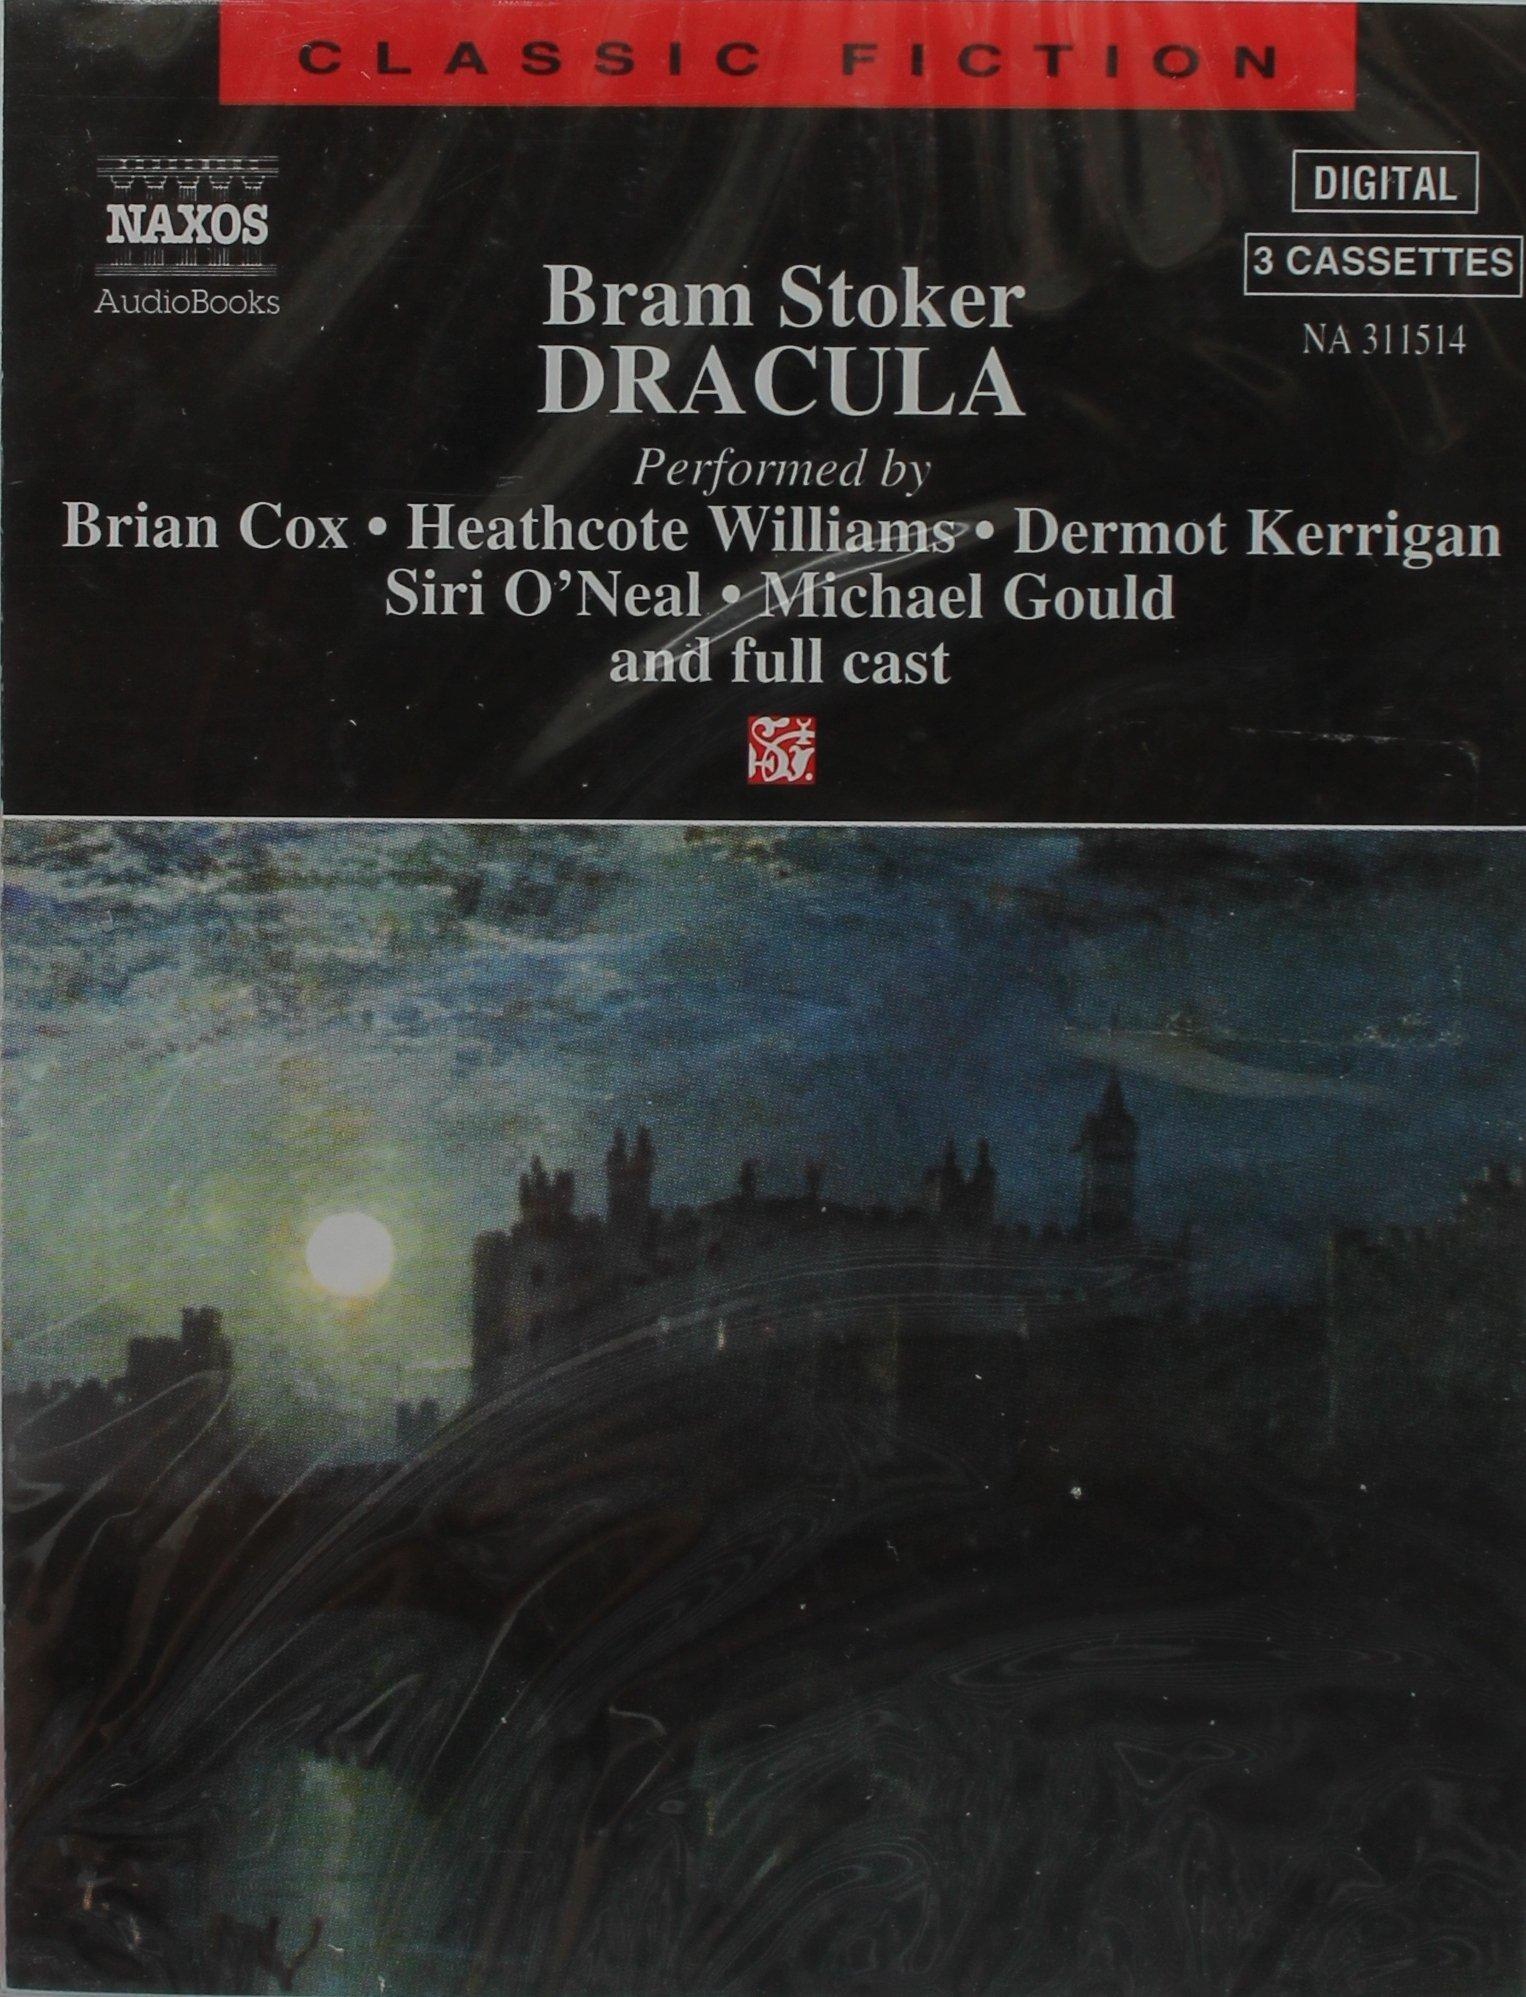 Dracula (Classic Fiction): Amazon.es: Bram Stoker, Feeney, et al, Brian Cox, Dermot Kerrigan, Heathcote Williams, Siri ONeal, Michael Gould: Libros en ...